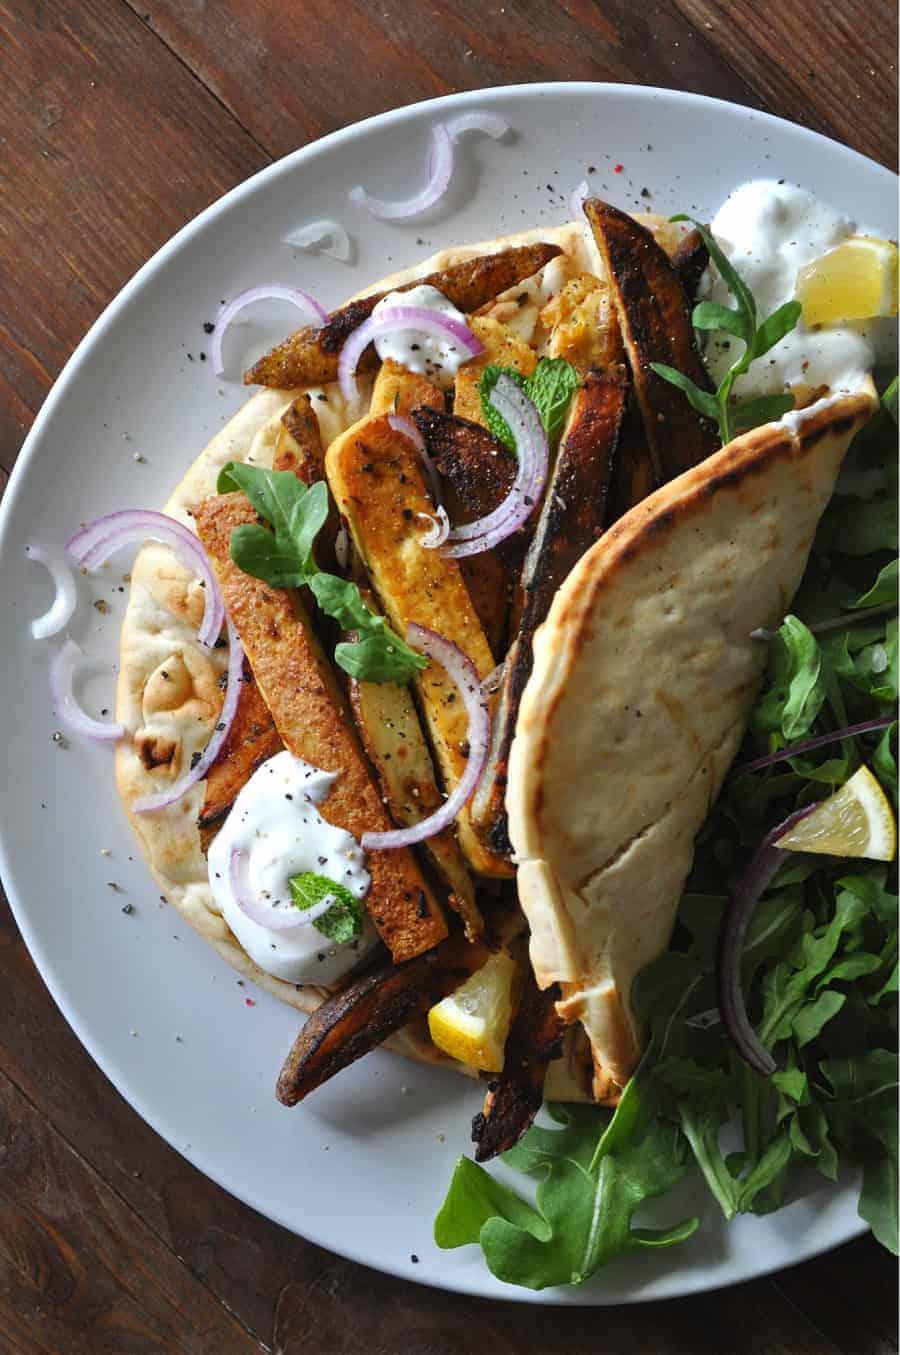 Vegan Greek Tofu and Fry Wraps